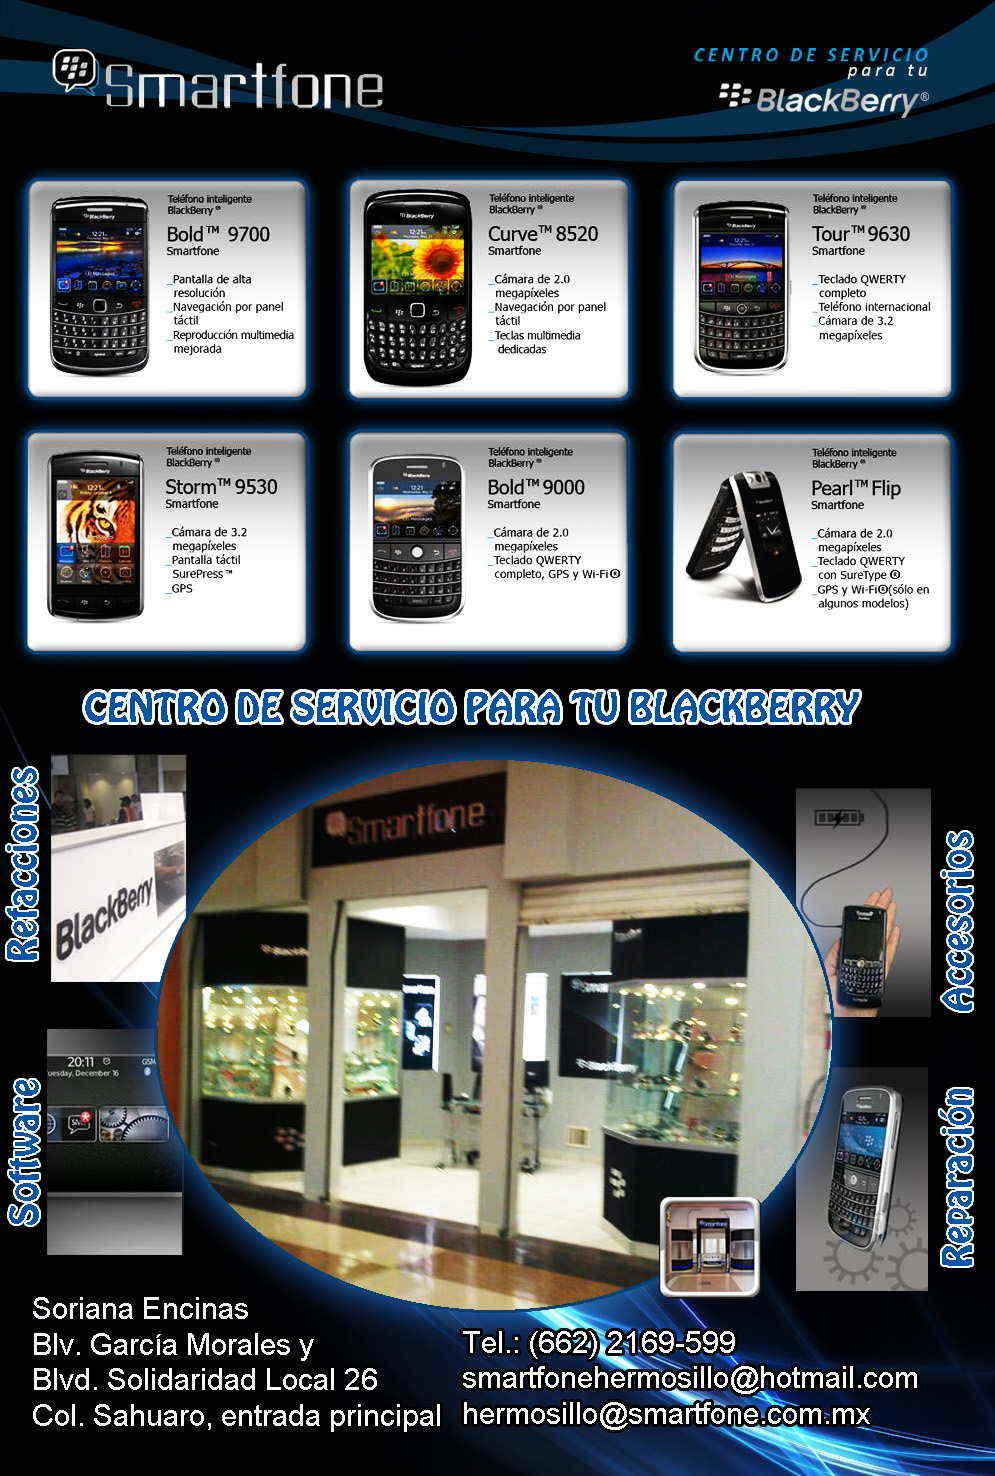 Smartfone en hermosillo anunciado por for Refaccionarias en hermosillo